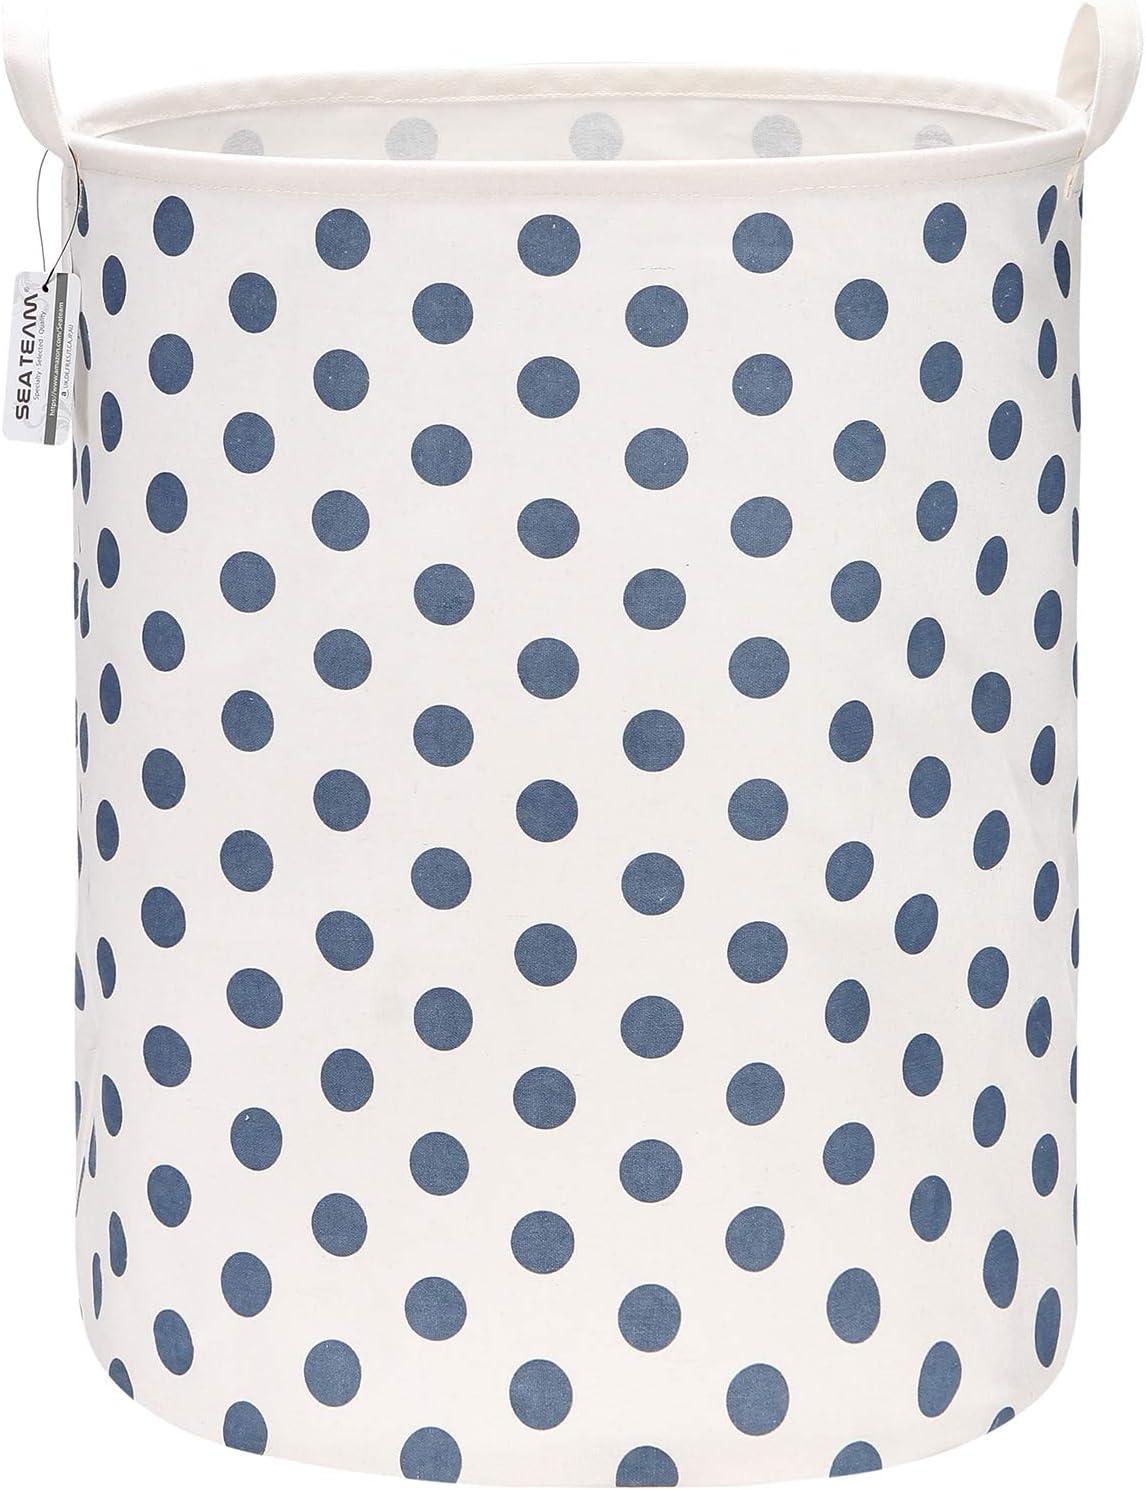 "Sea Team 19.7 Inches Large Sized Waterproof Coating Ramie Cotton Fabric Folding Laundry Hamper Bucket Cylindric Burlap Canvas Storage Basket with Stylish Polka Dot Design (19.7"", Blue)"